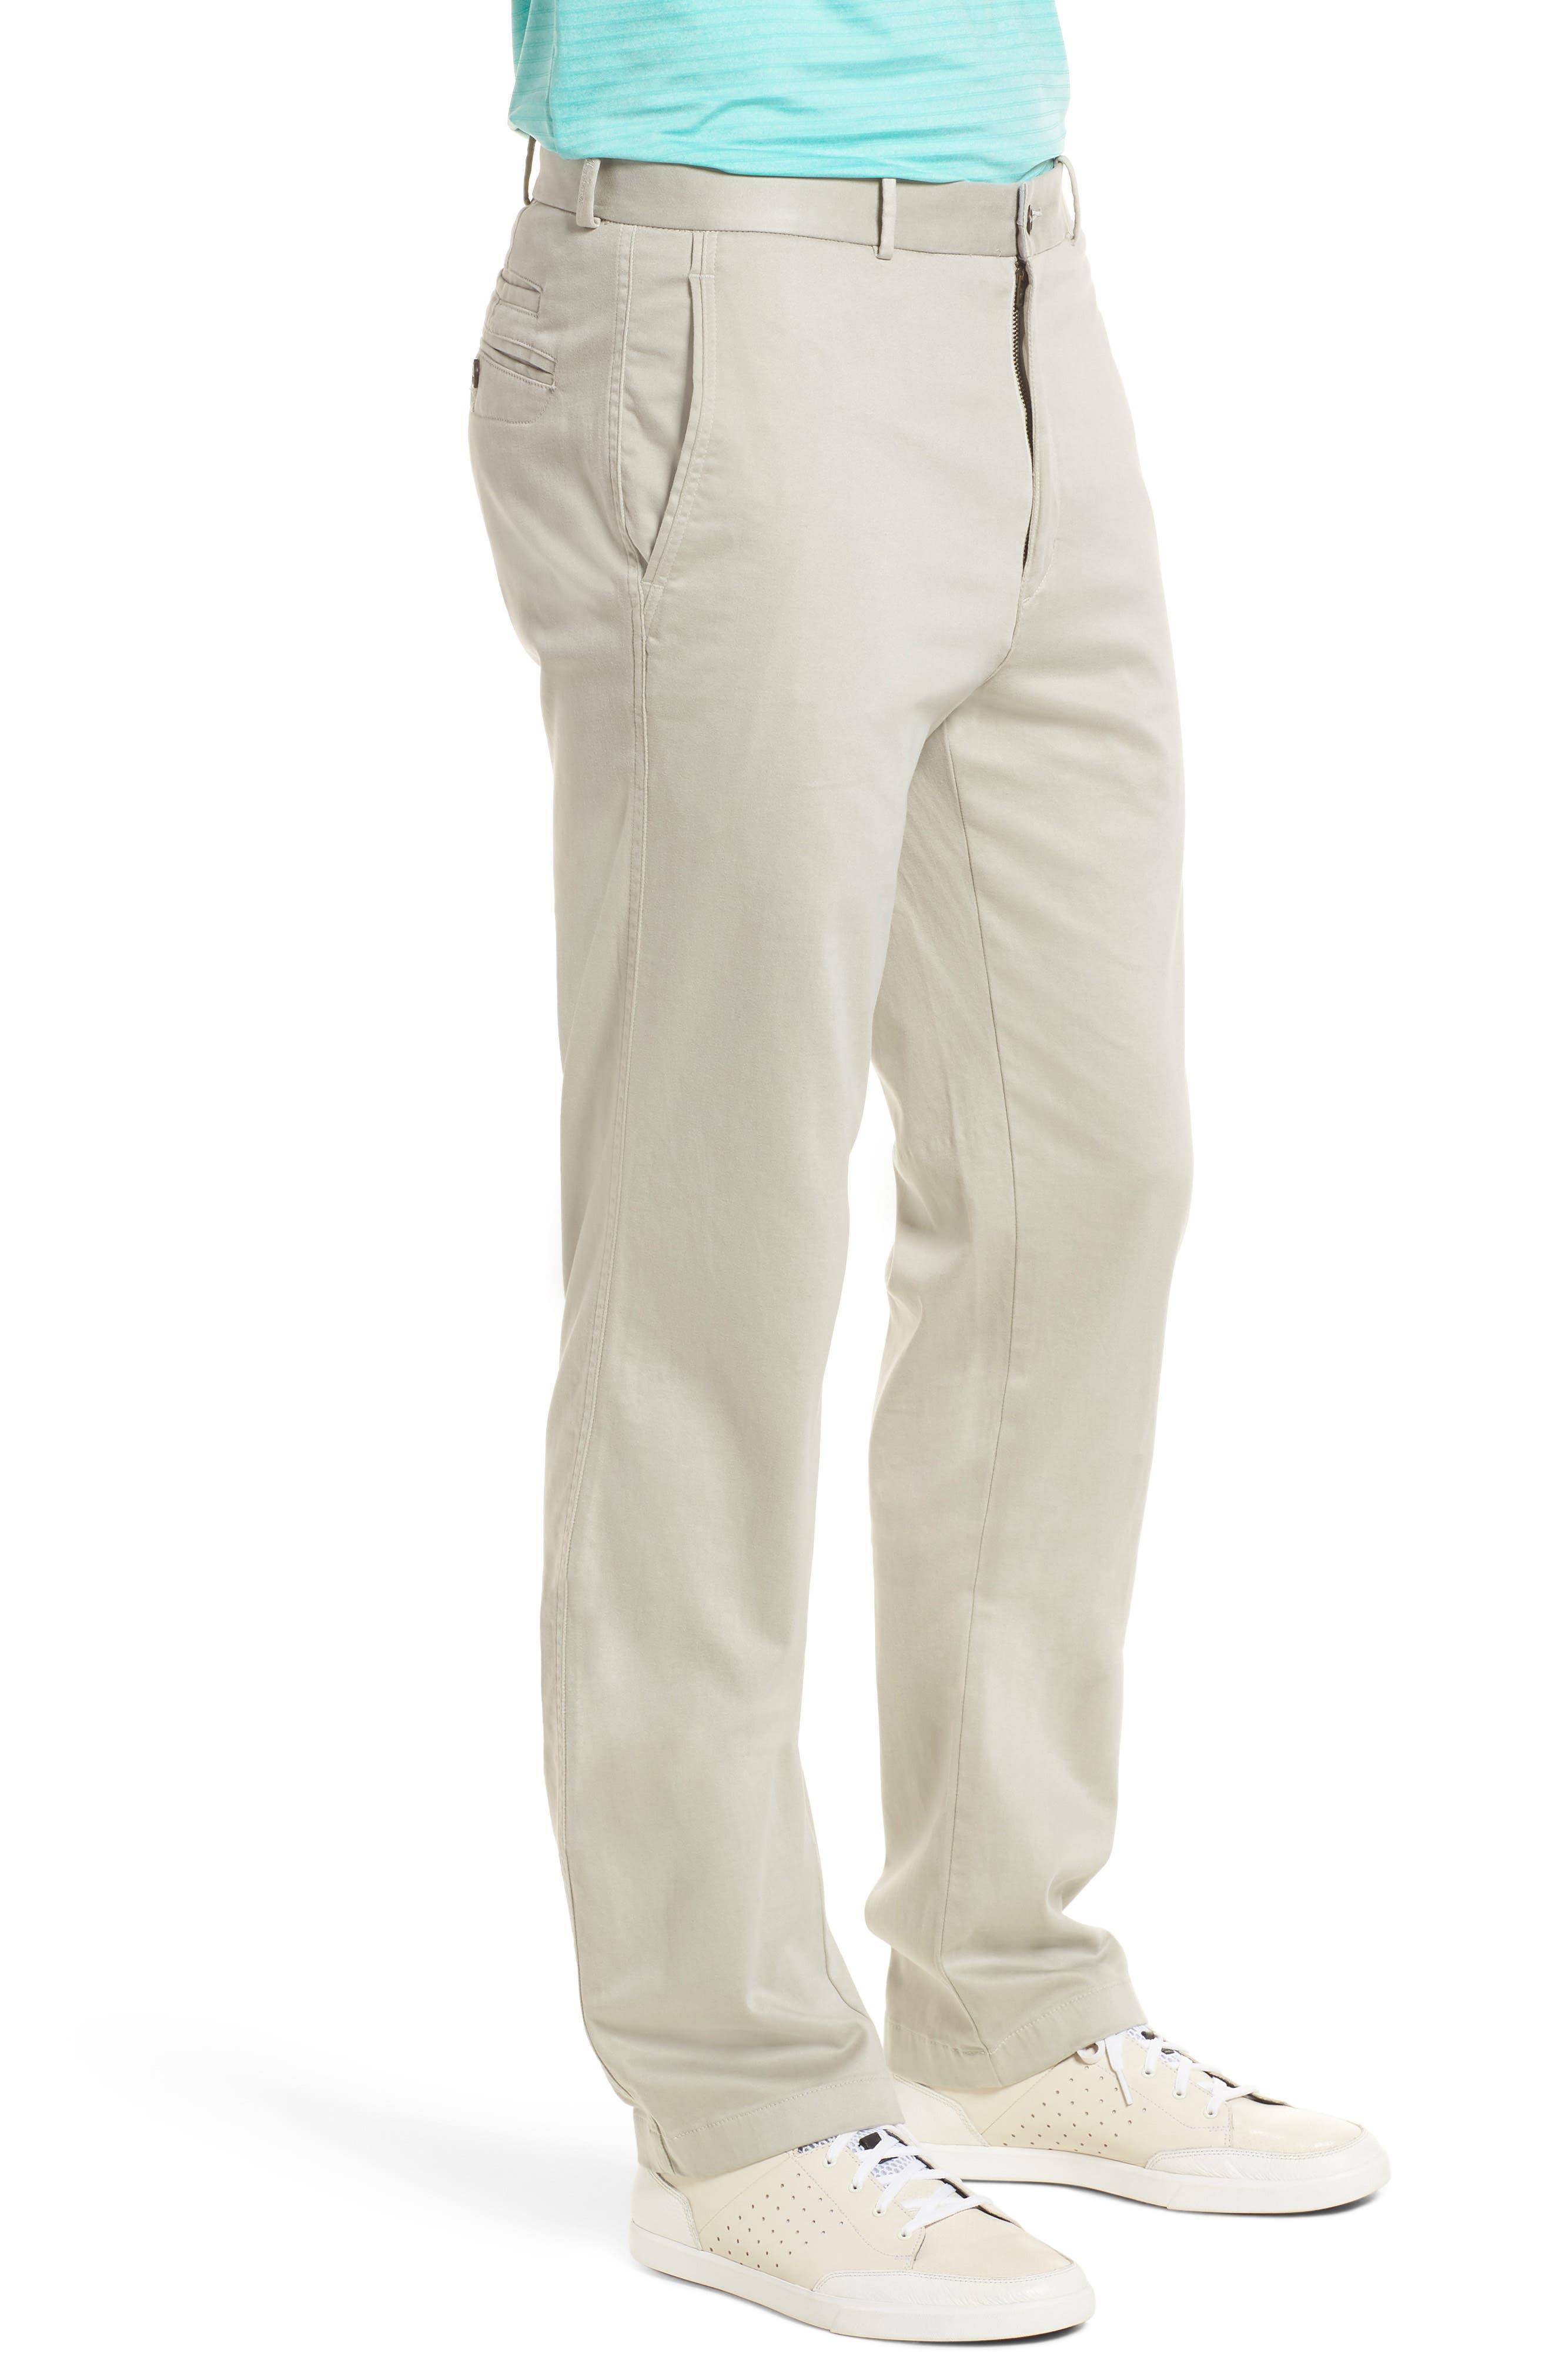 St. Charles Brushed Chino Pants,                             Alternate thumbnail 3, color,                             051